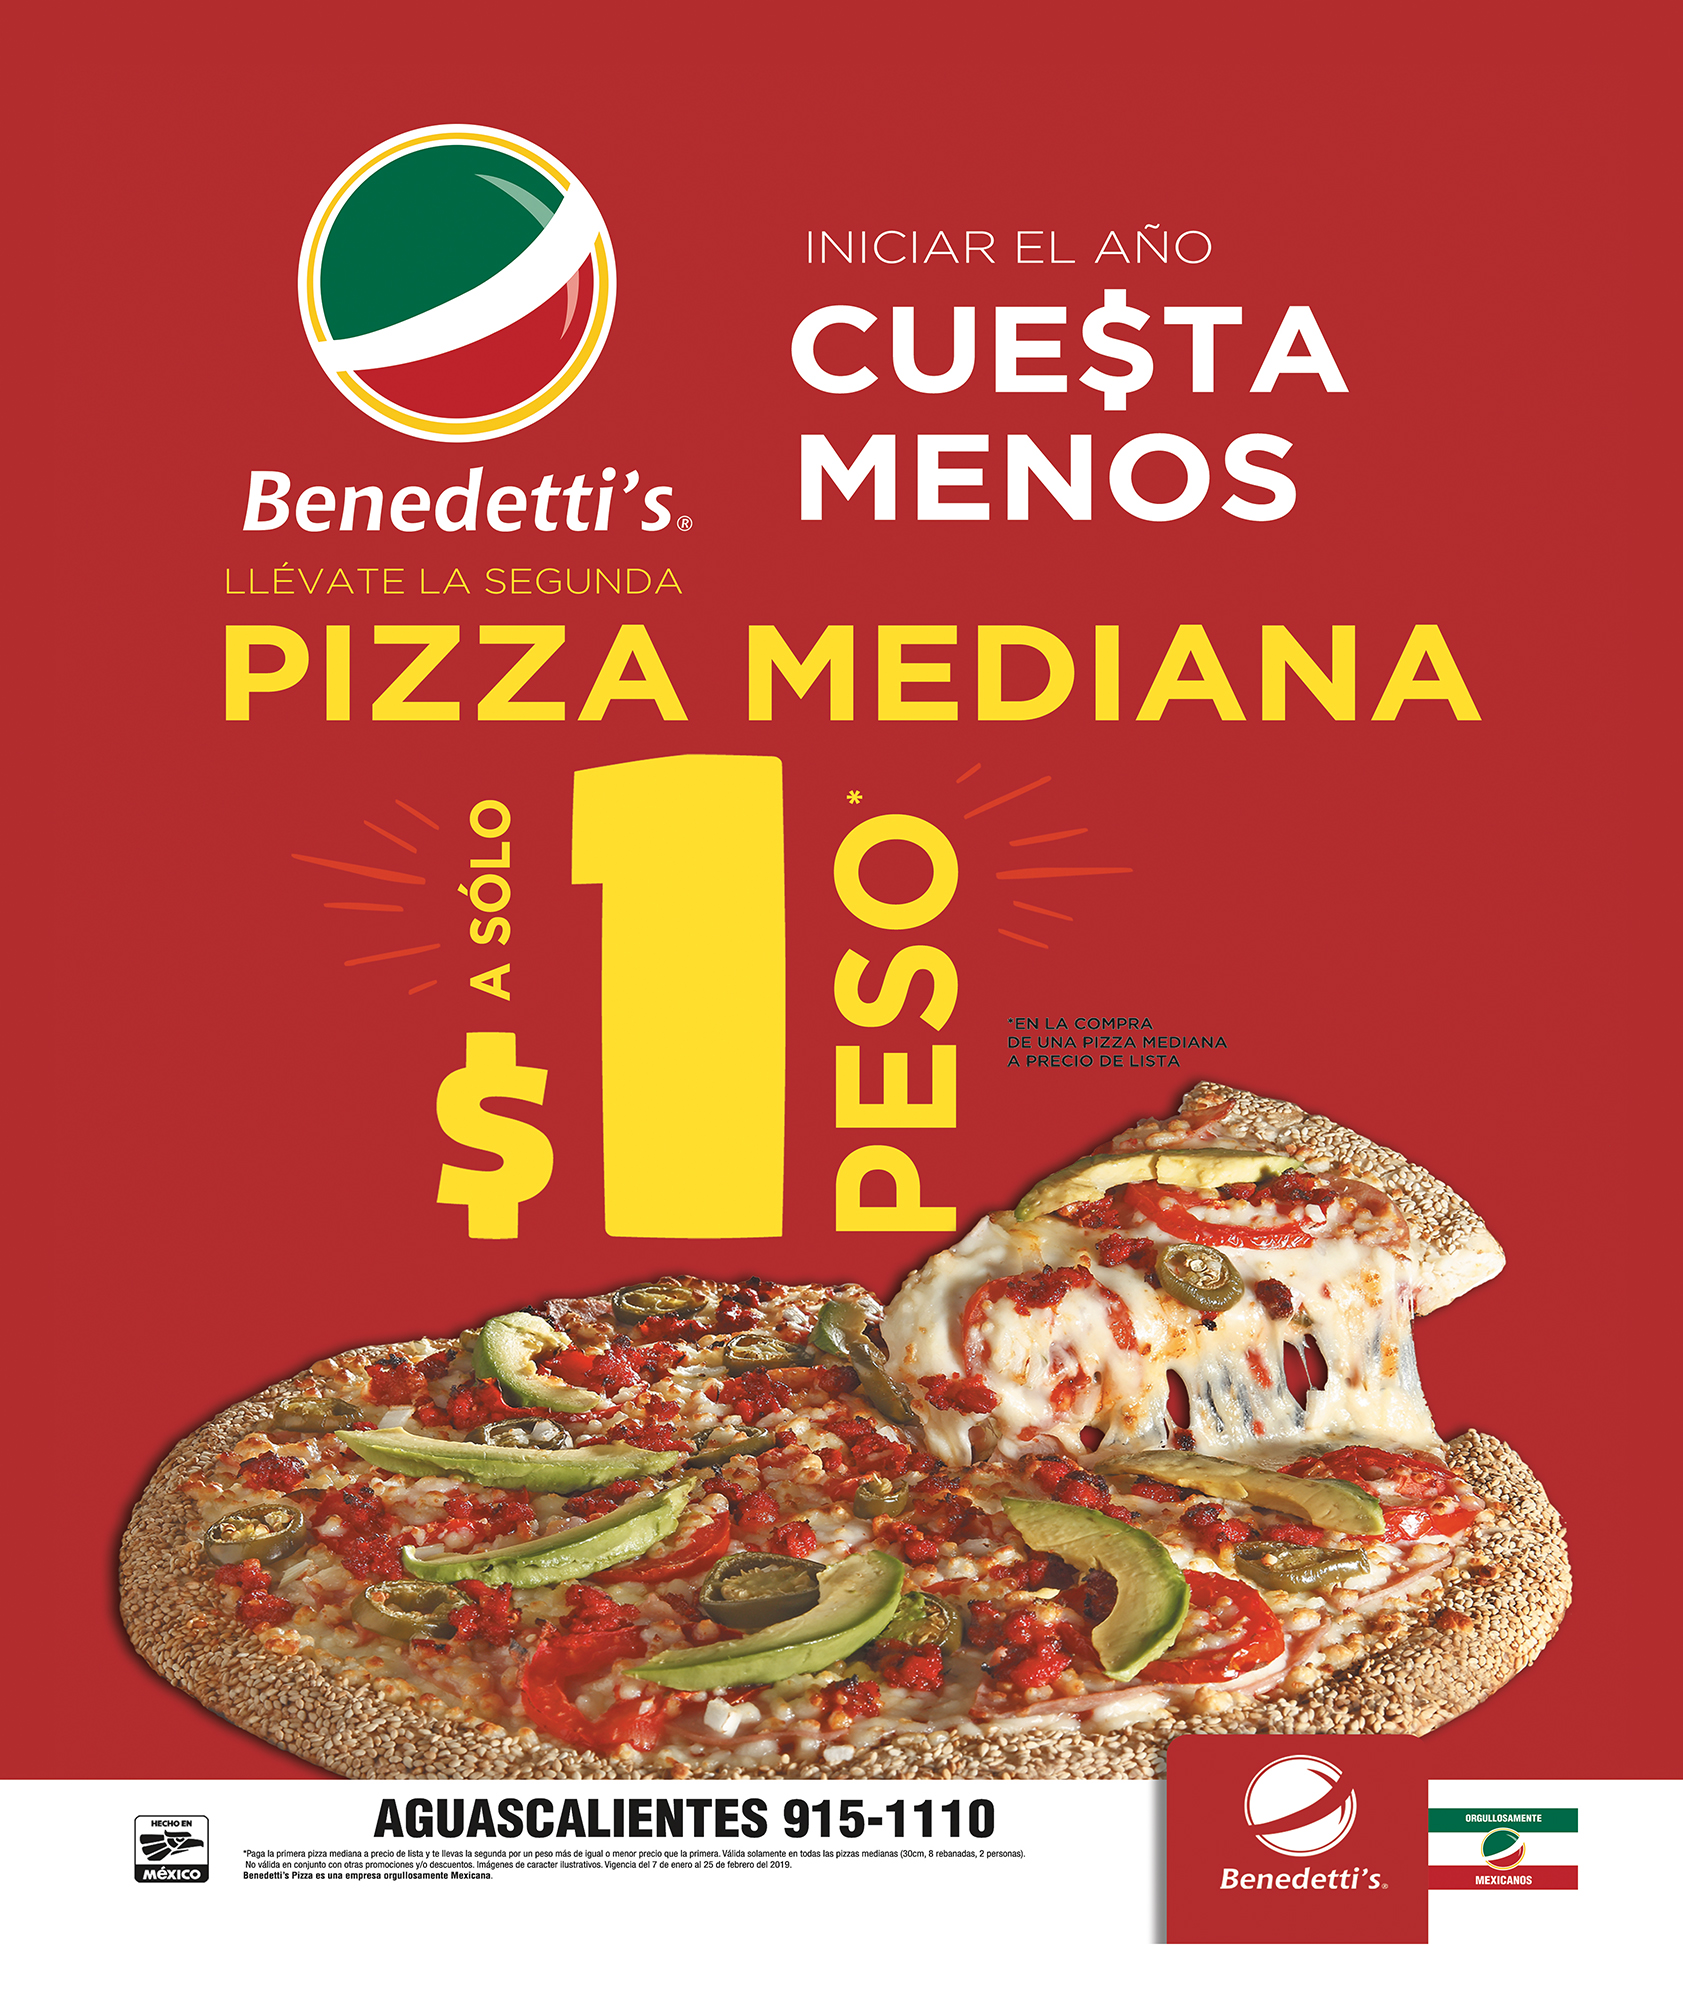 BENEDETTIS 8 ENERO 19